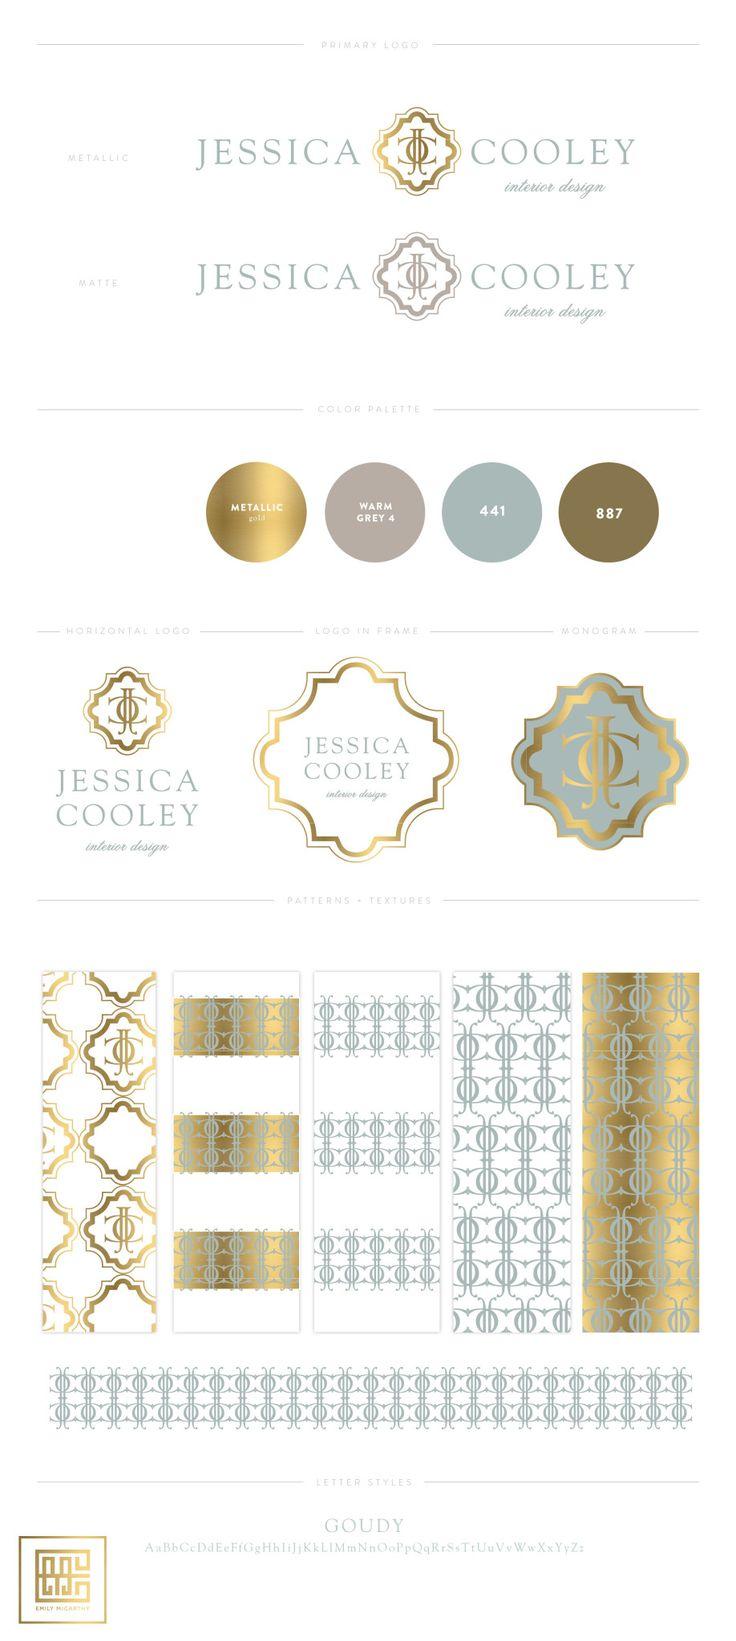 Emily McCarthy Branding | Jessica Cooley Interior Design Branding Board | www.emilymccarthy.com #branding